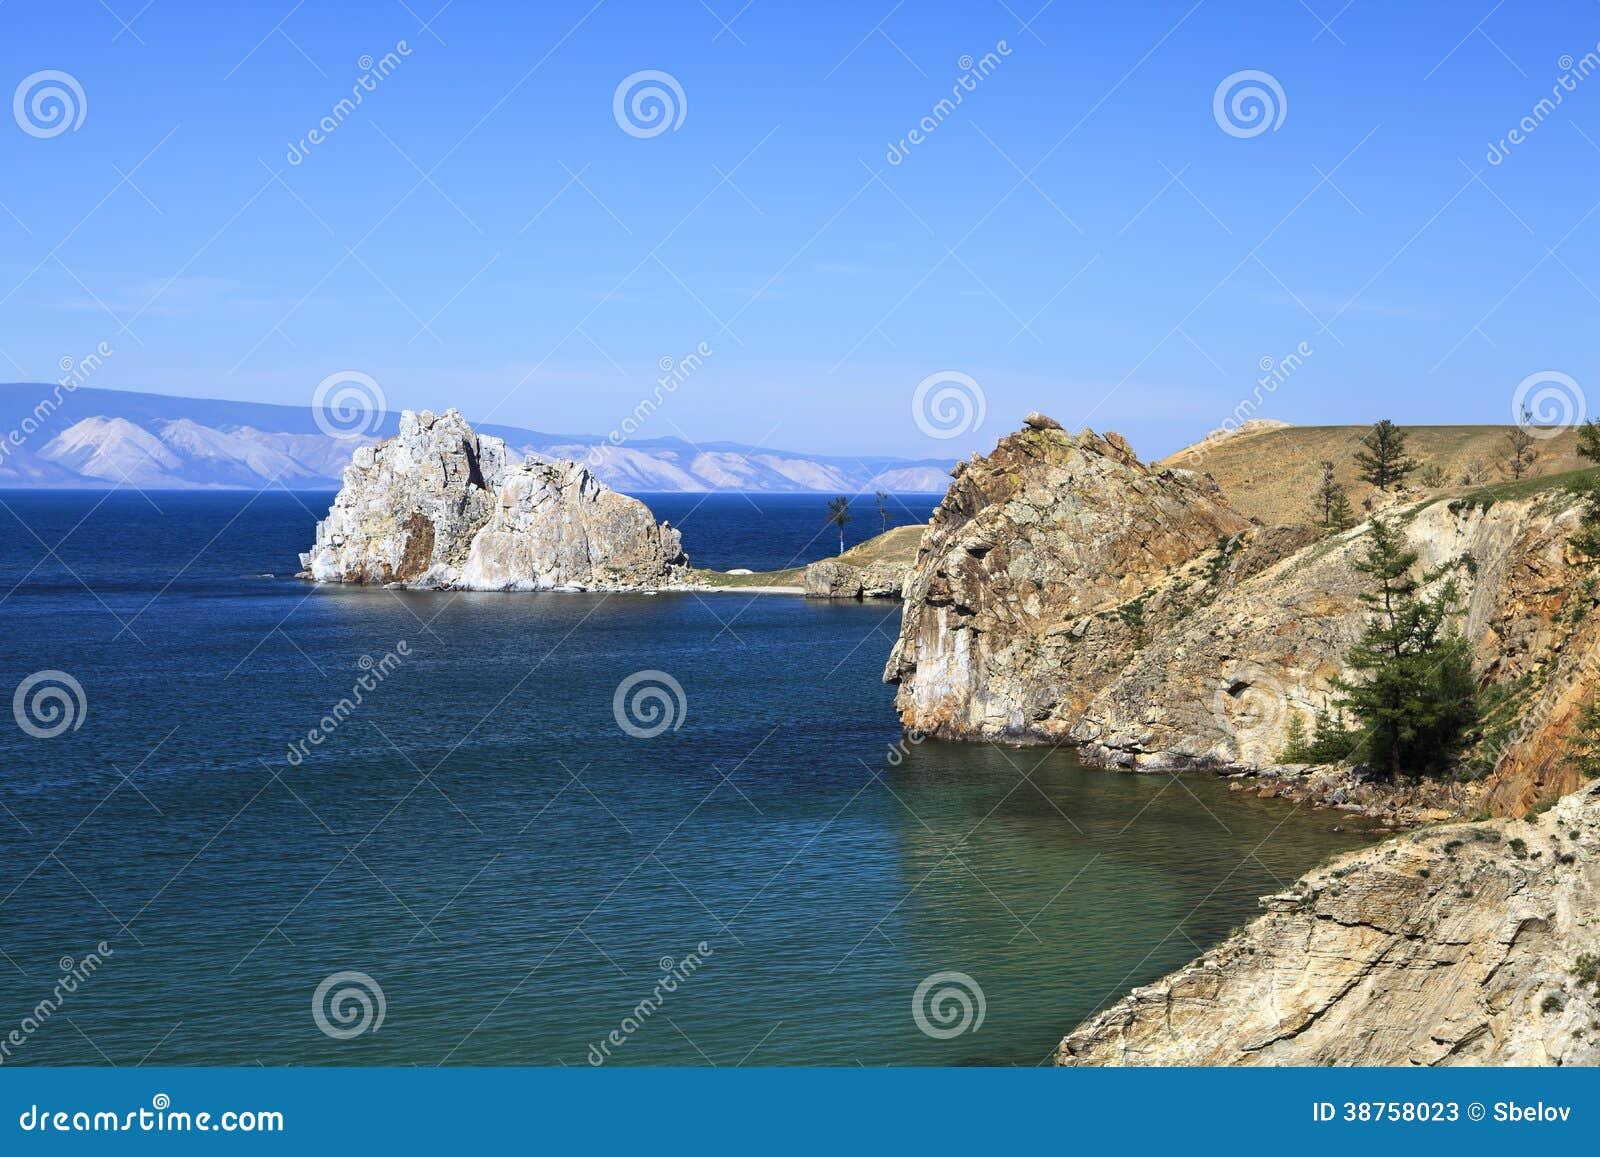 Cape Burhan and Shaman Rock on Olkhon Island at Baikal Lake, Russia.